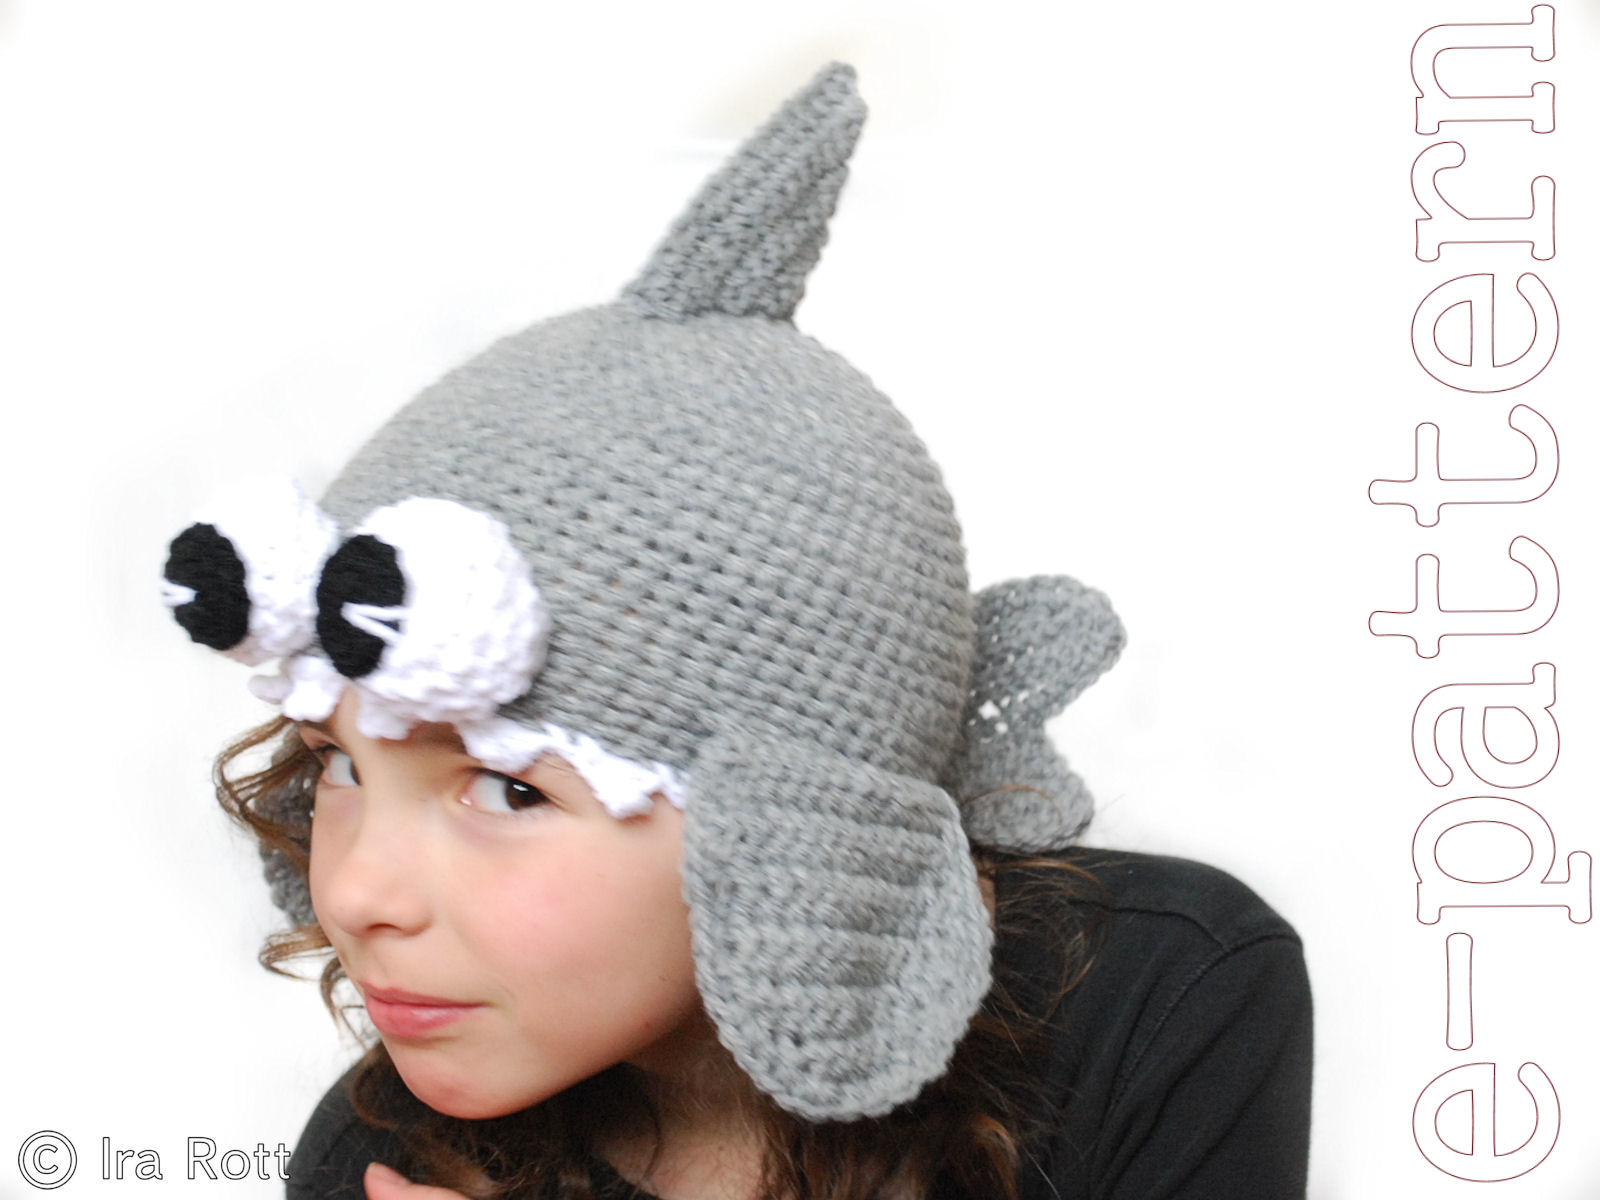 Fashion crochet design by ira rott shark hat with googly eyes for shark hat with googly eyes for boy or girl crochet e pattern for 4 sizes bankloansurffo Choice Image